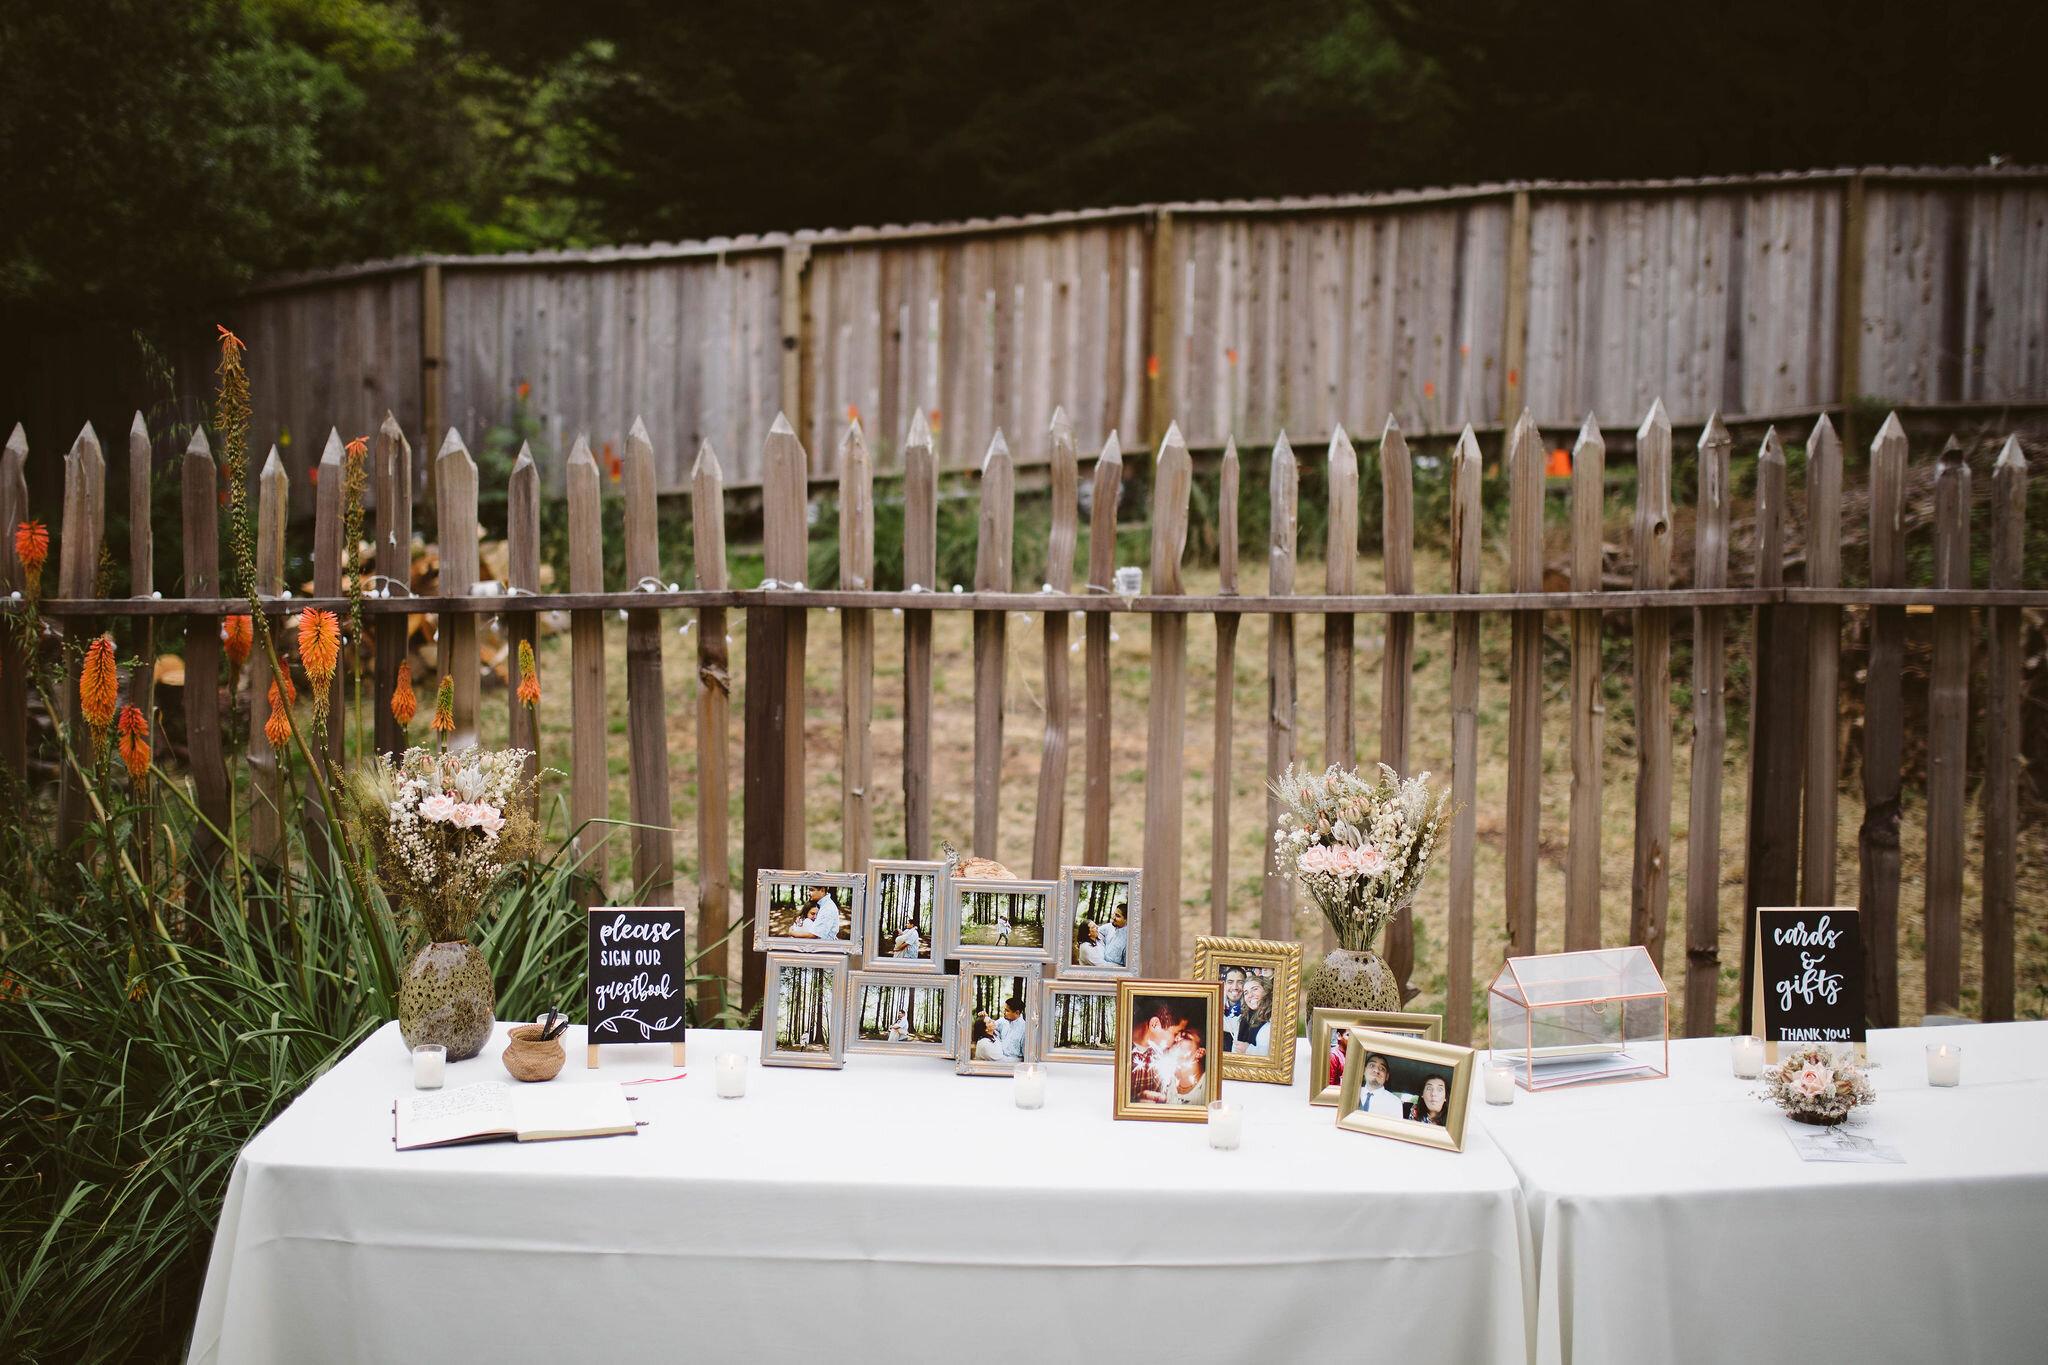 Venture-Retreat-Center-Wedding-Pescadero-Sat-Aaron-Pritam-The-Shalom-Imaginative-662.jpg